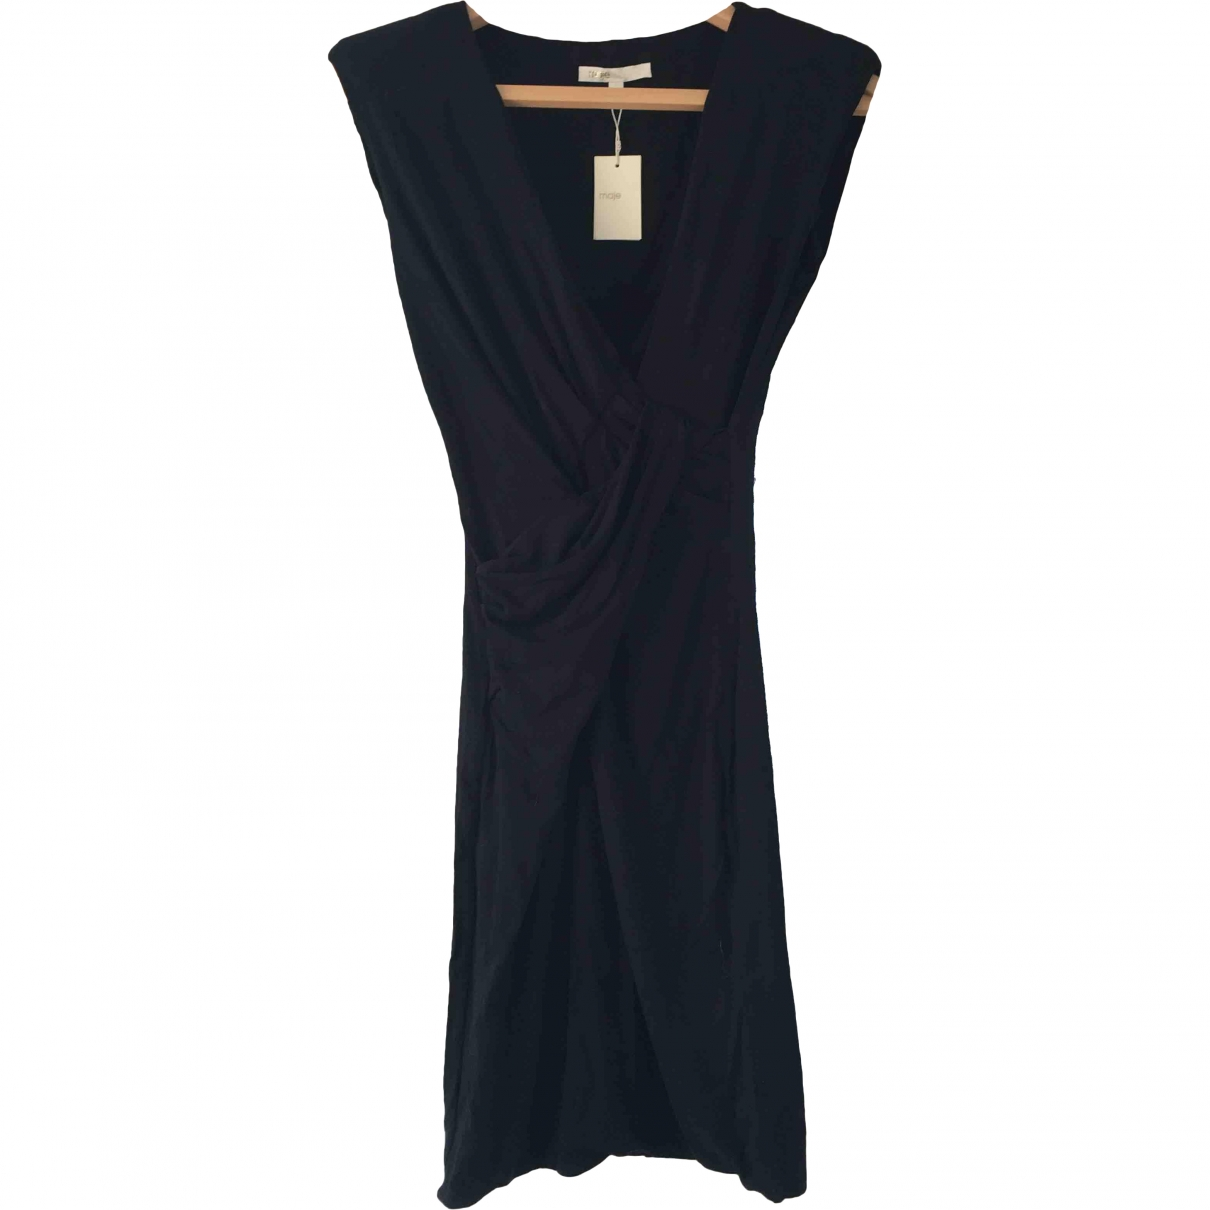 Maje \N Black dress for Women 36 FR